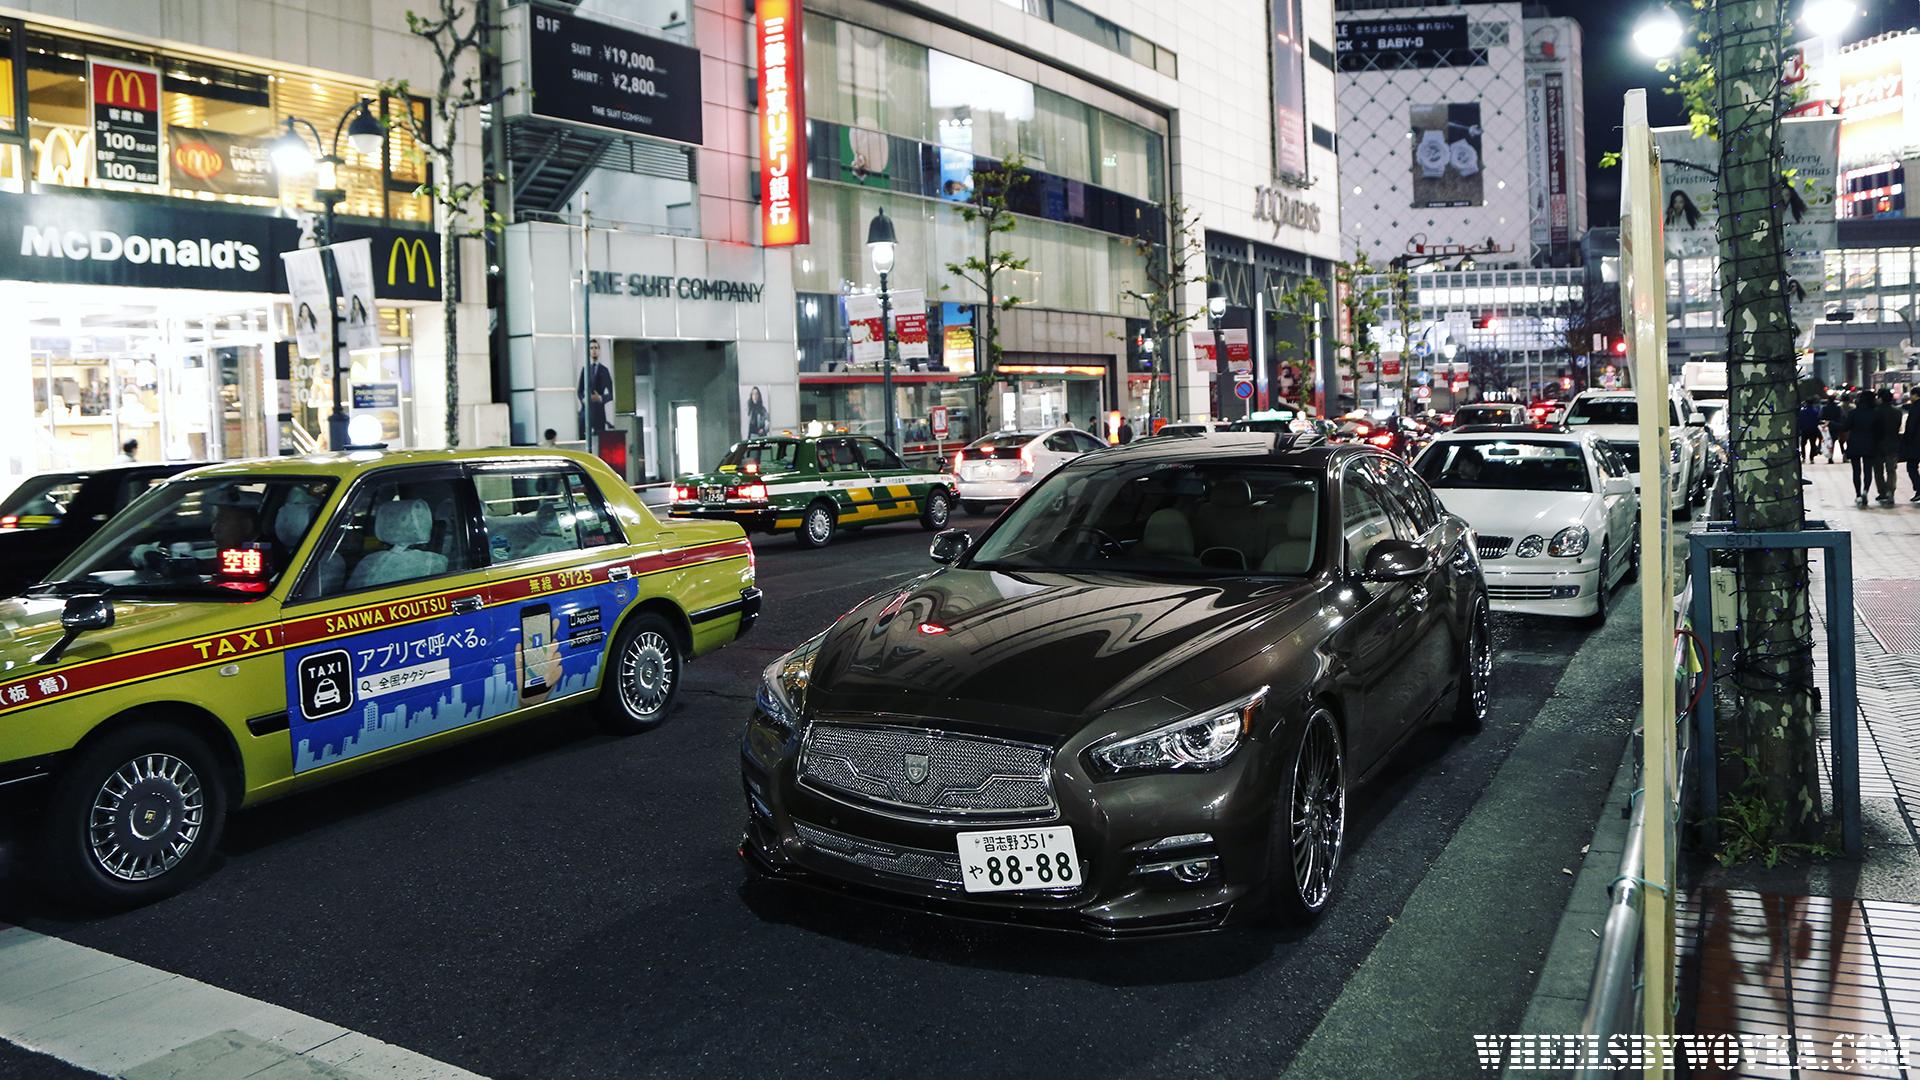 shibuya-japan-tokyo-lowrider-cruise-night-42